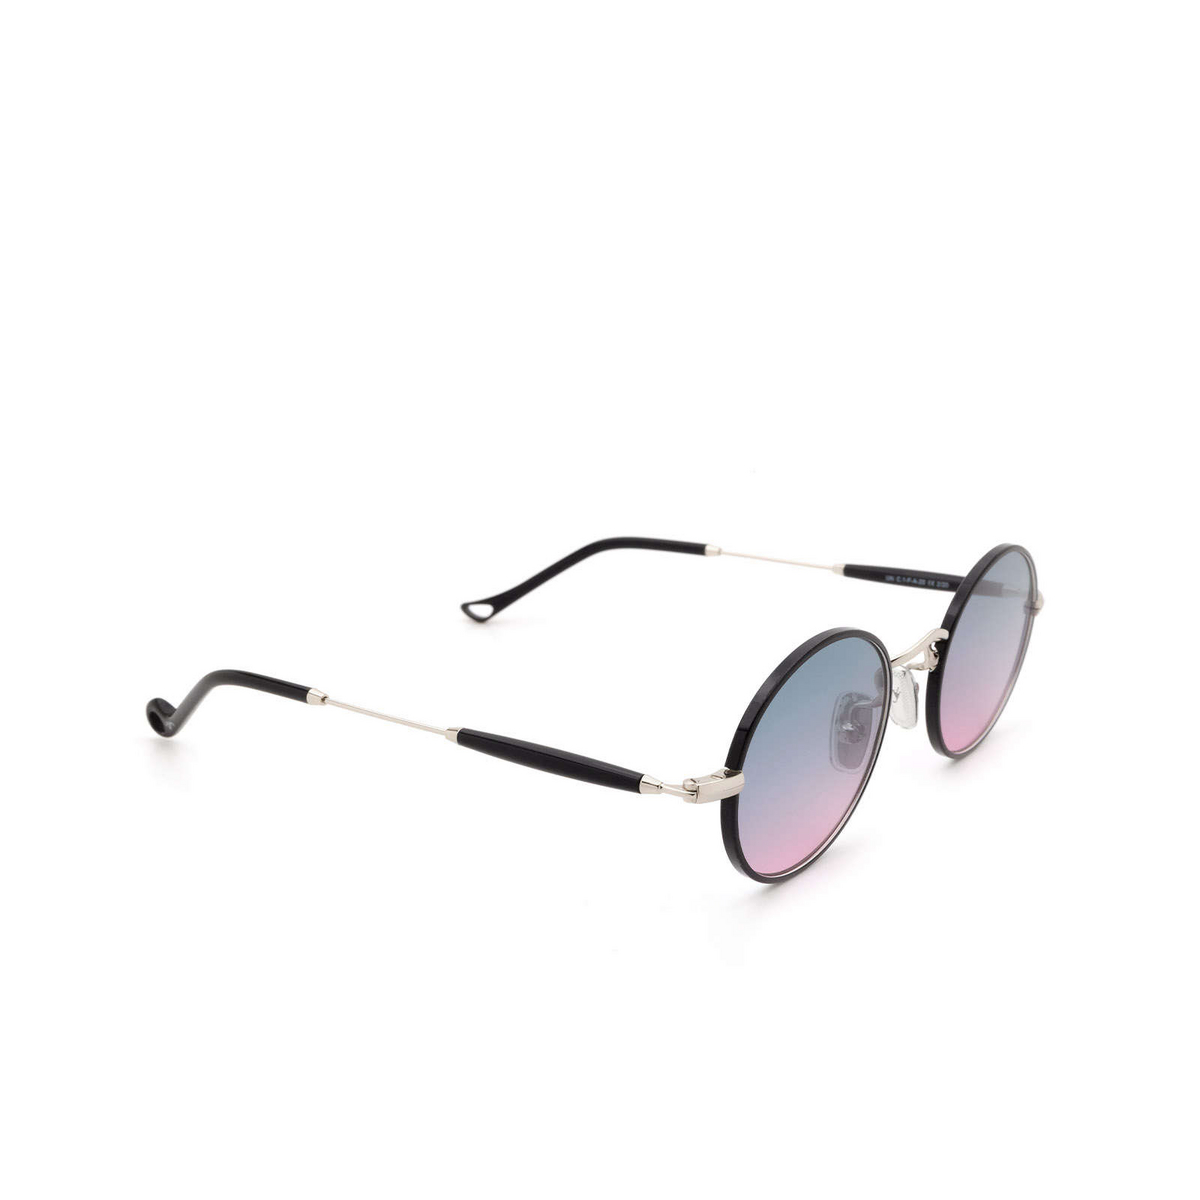 Eyepetizer® Round Sunglasses: Un color Black C.1-F-A-20 - three-quarters view.